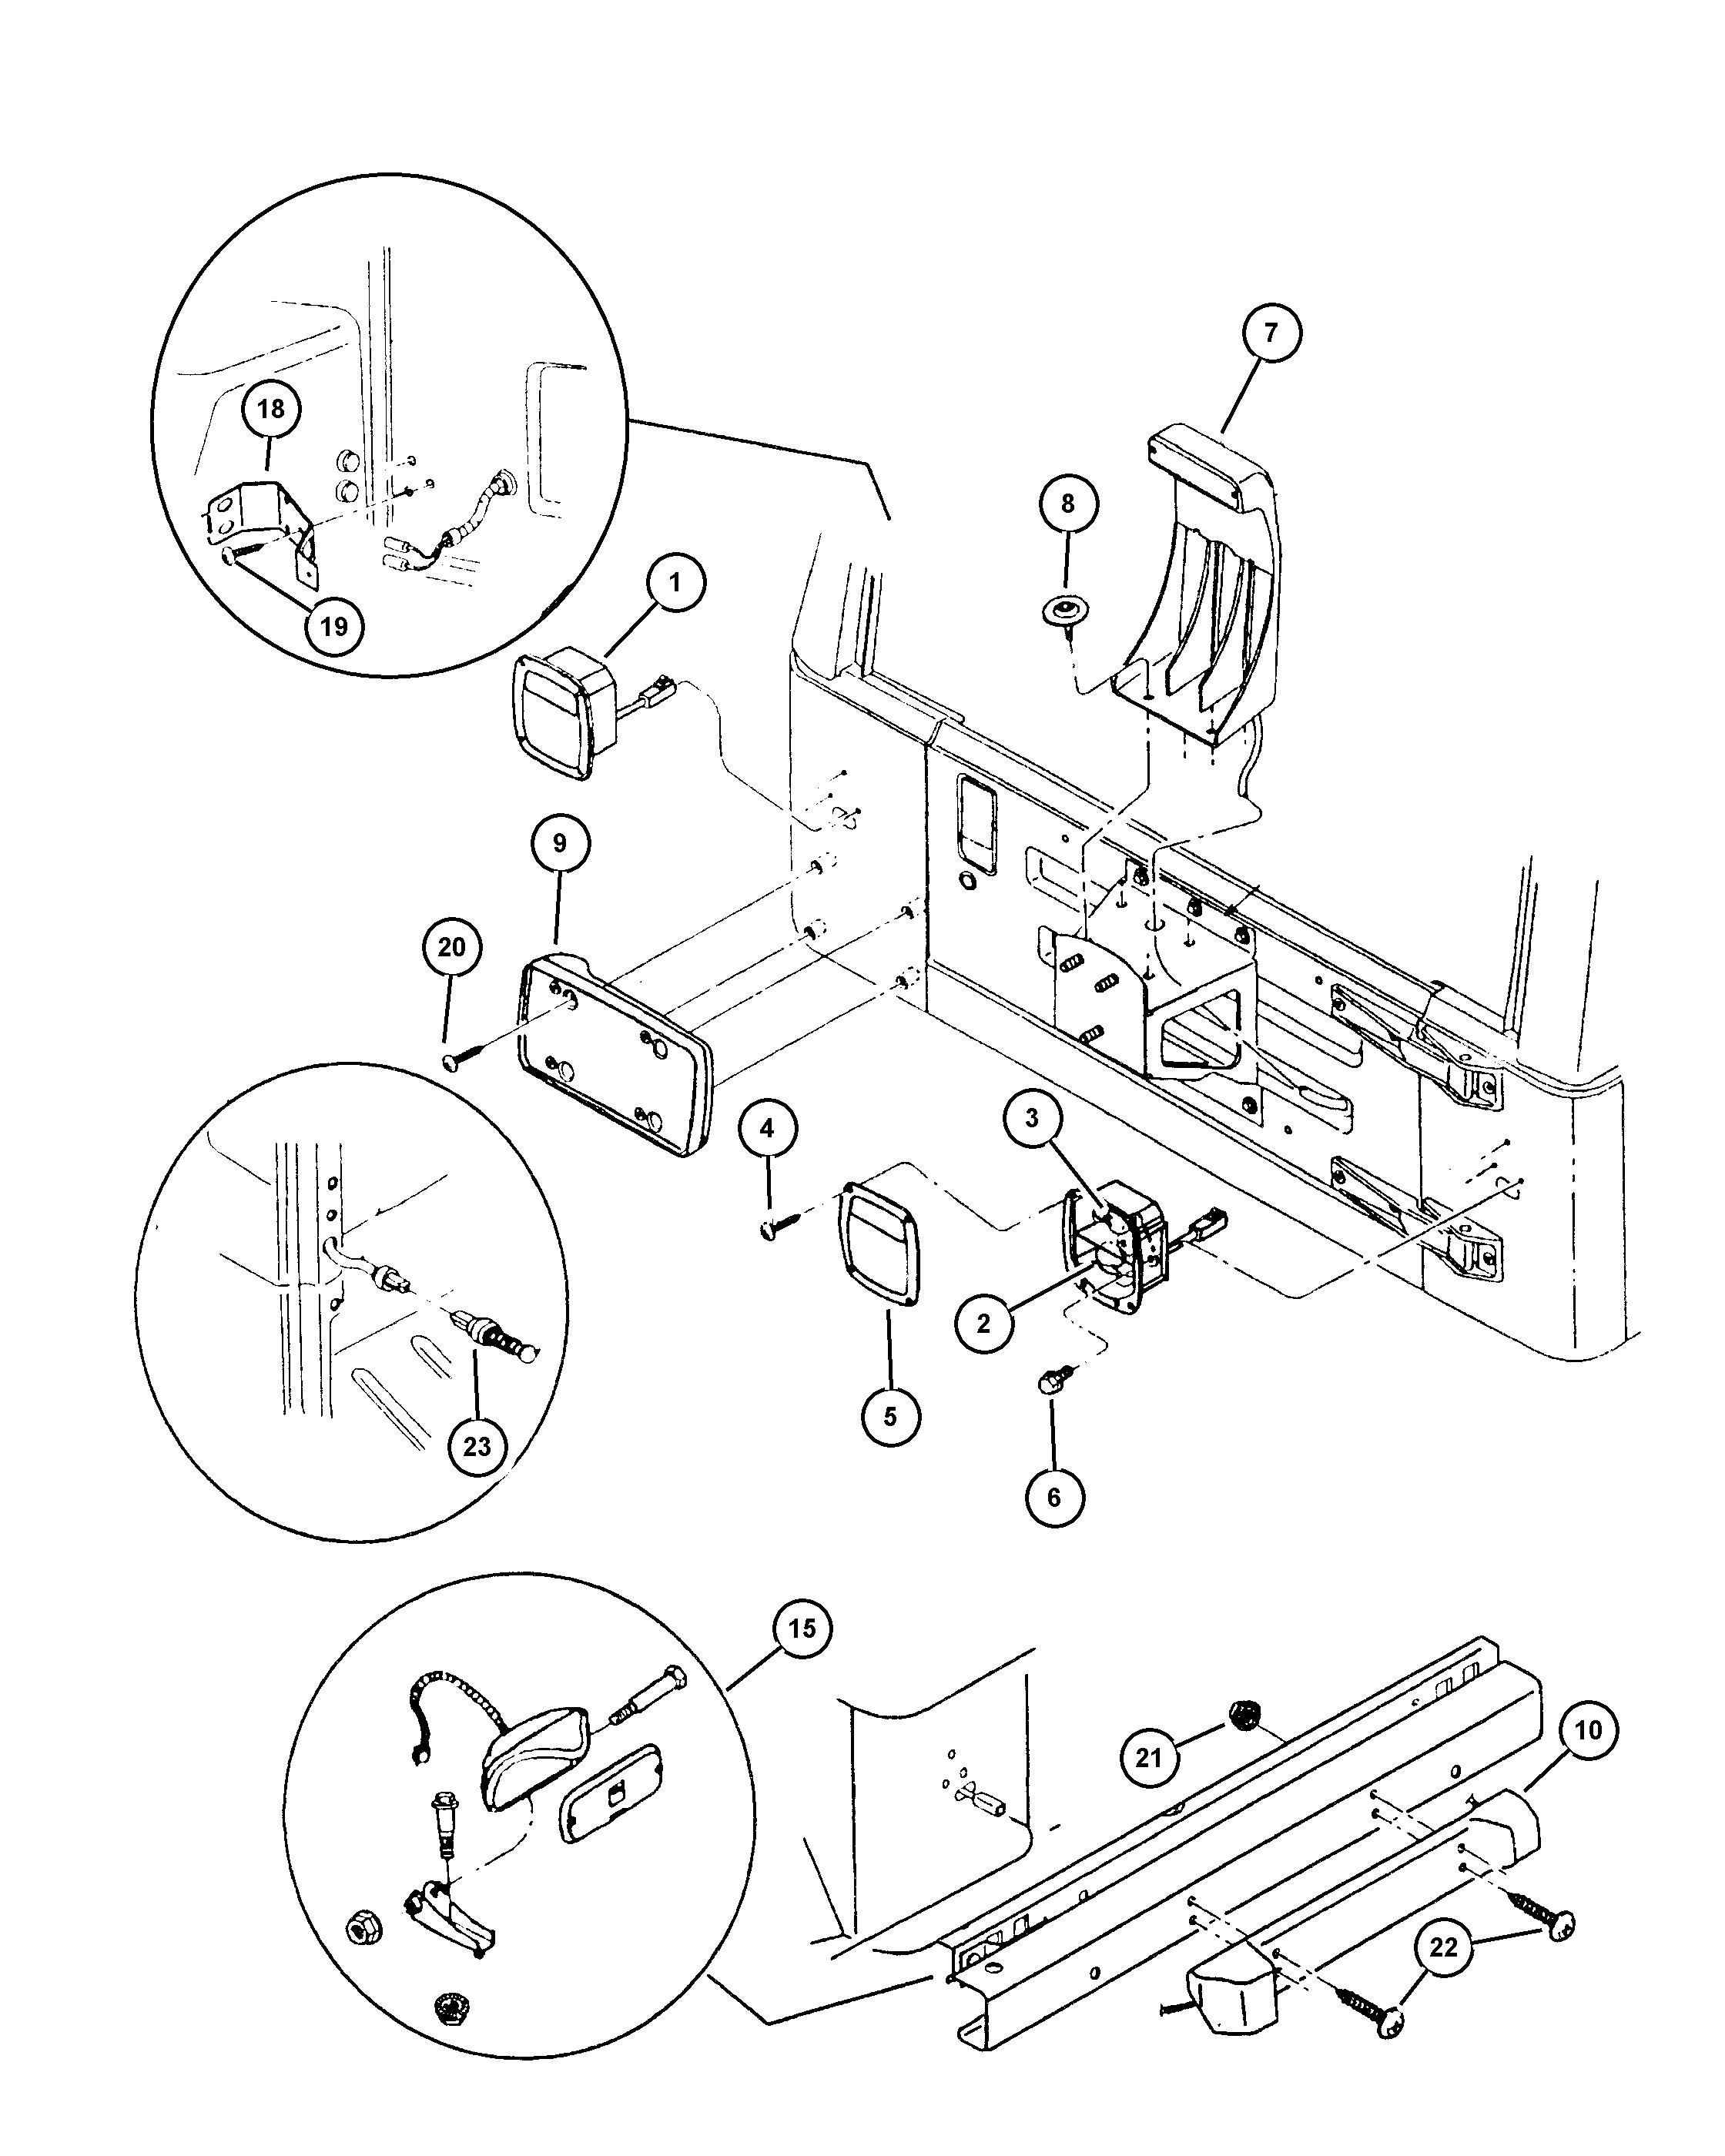 01 jeep grand cherokee rear l wiring diagram wiring diagram Whelen Strobe Light Wiring Diagram chrysler 2000 tj jeep wrangler 8 electrical 21 1110 l s rear 01 jeep grand cherokee wiring schematic 01 jeep grand cherokee rear l wiring diagram